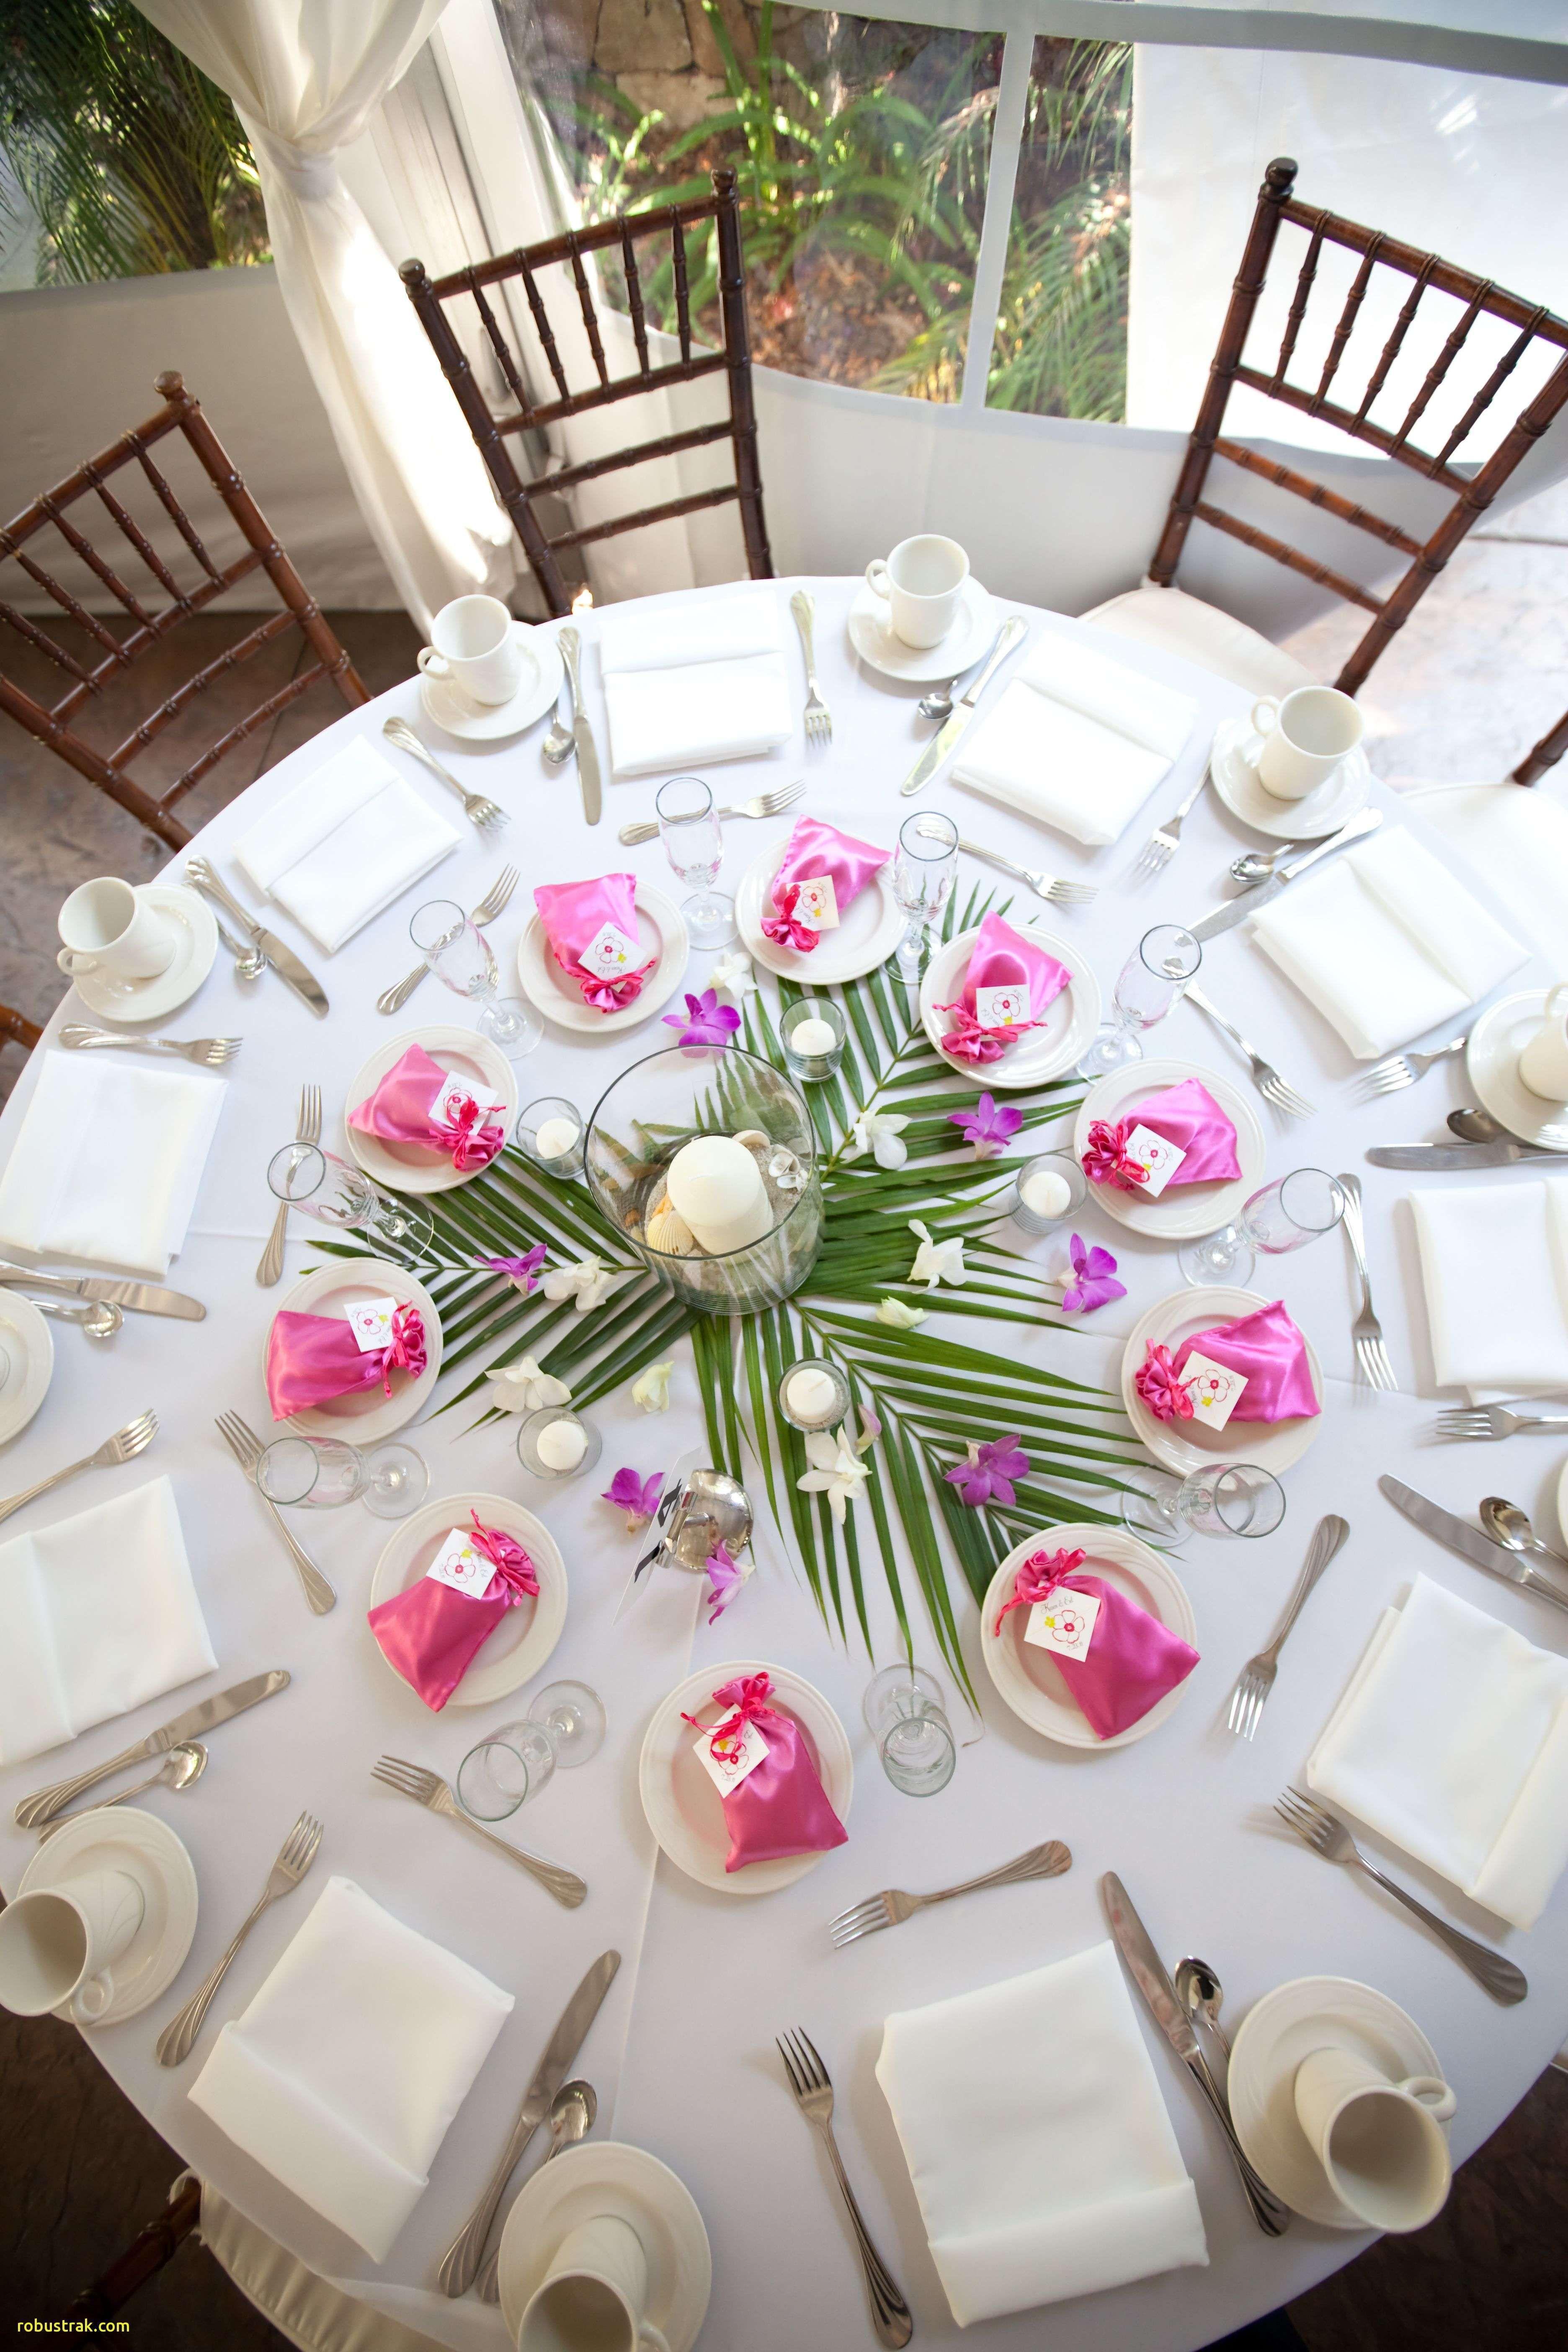 garden ridge wedding decorations round wedding tables on classy backyard design ideas may be you never think id=19399